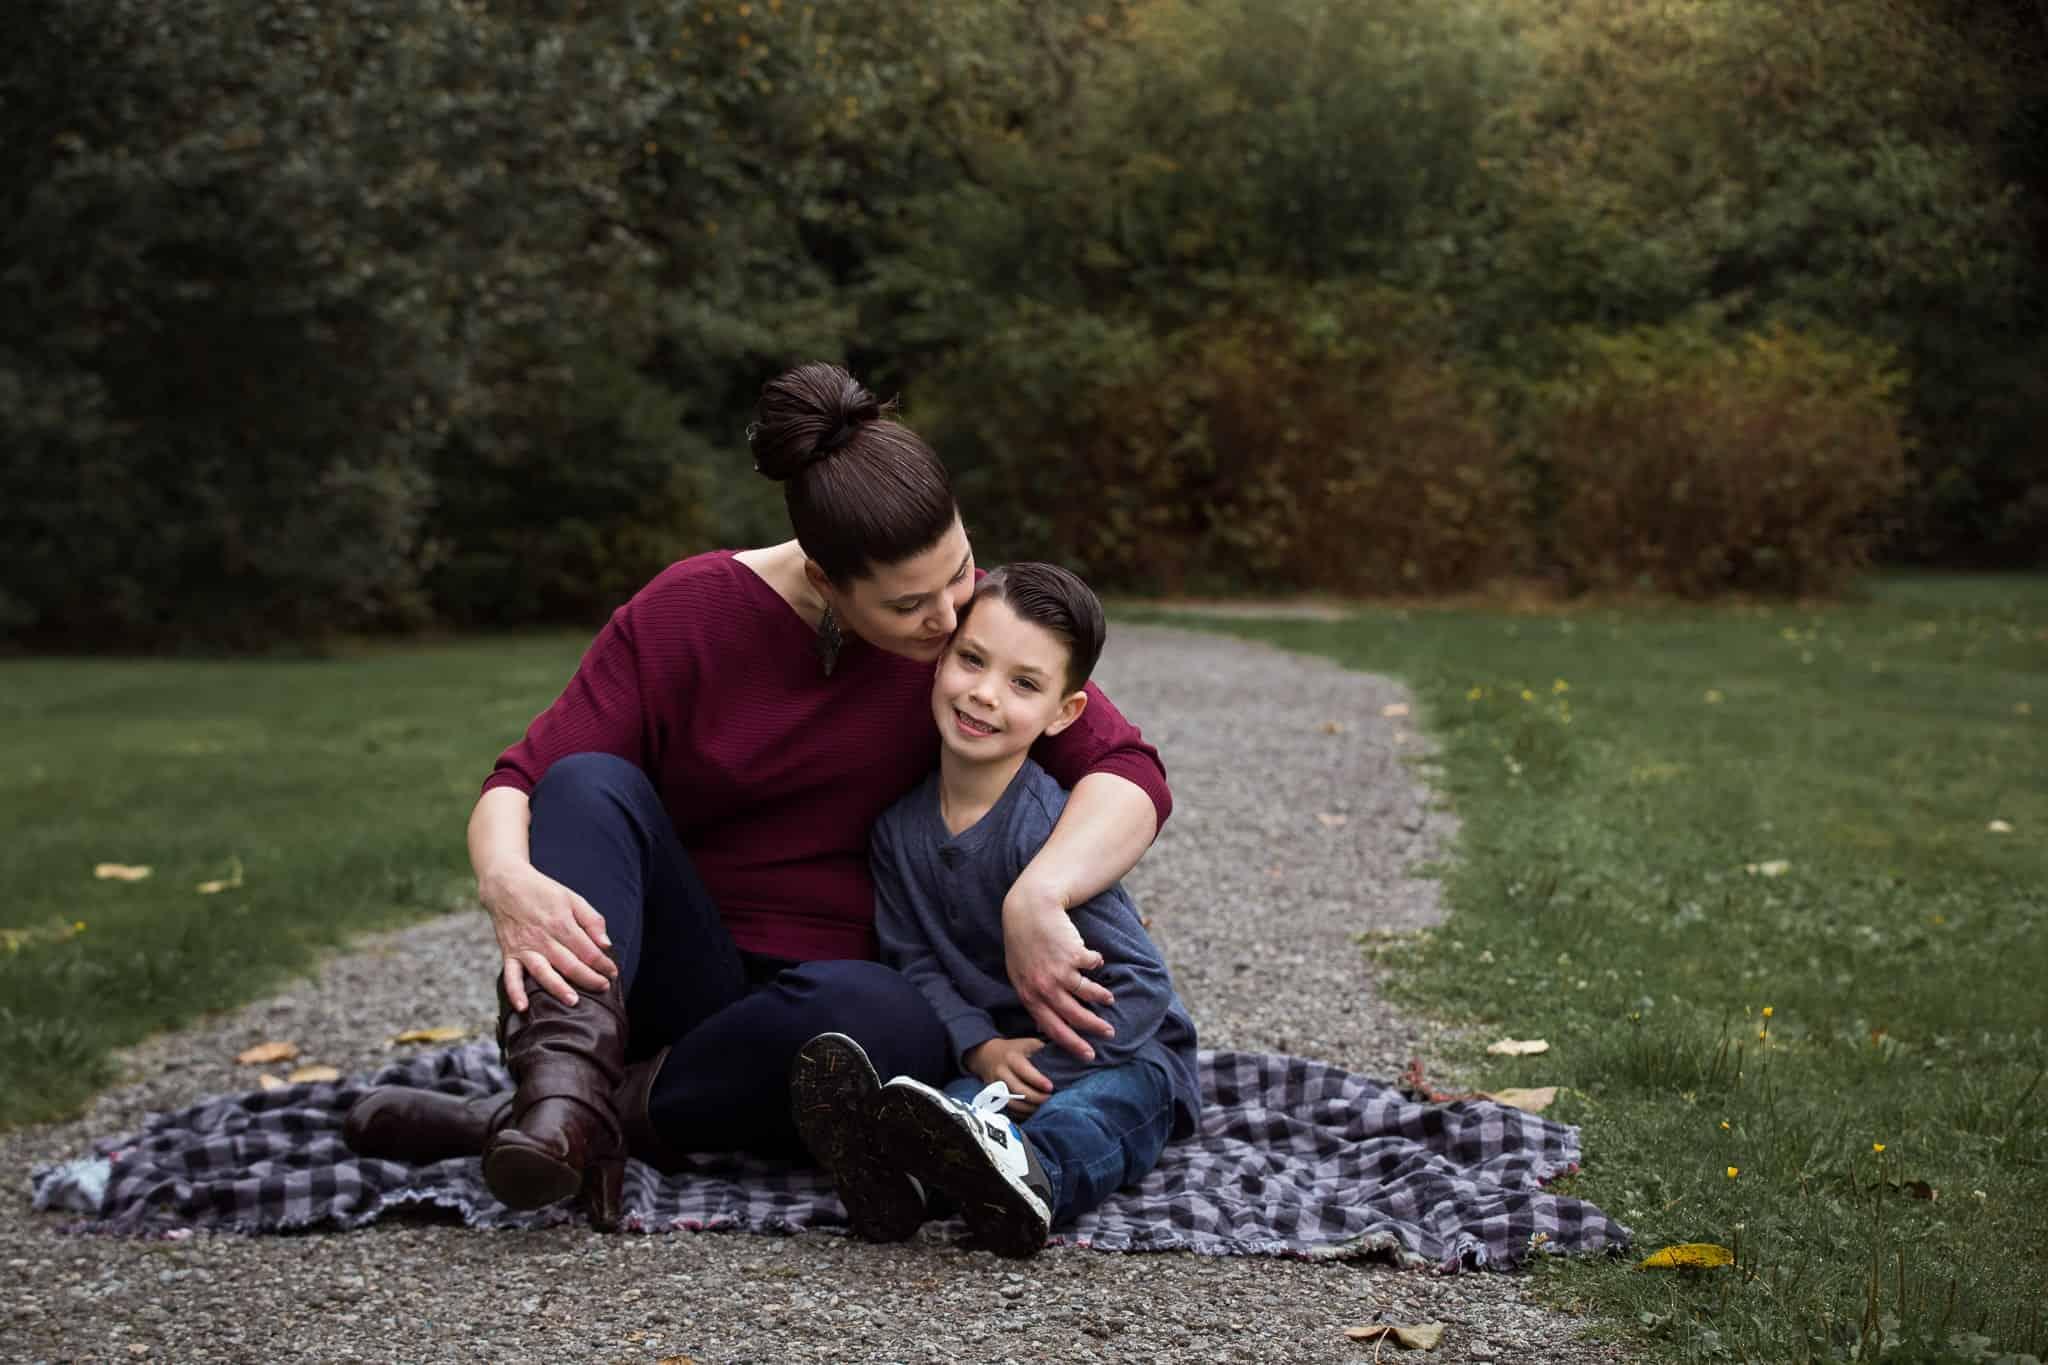 mom hugging her son close on a blanket